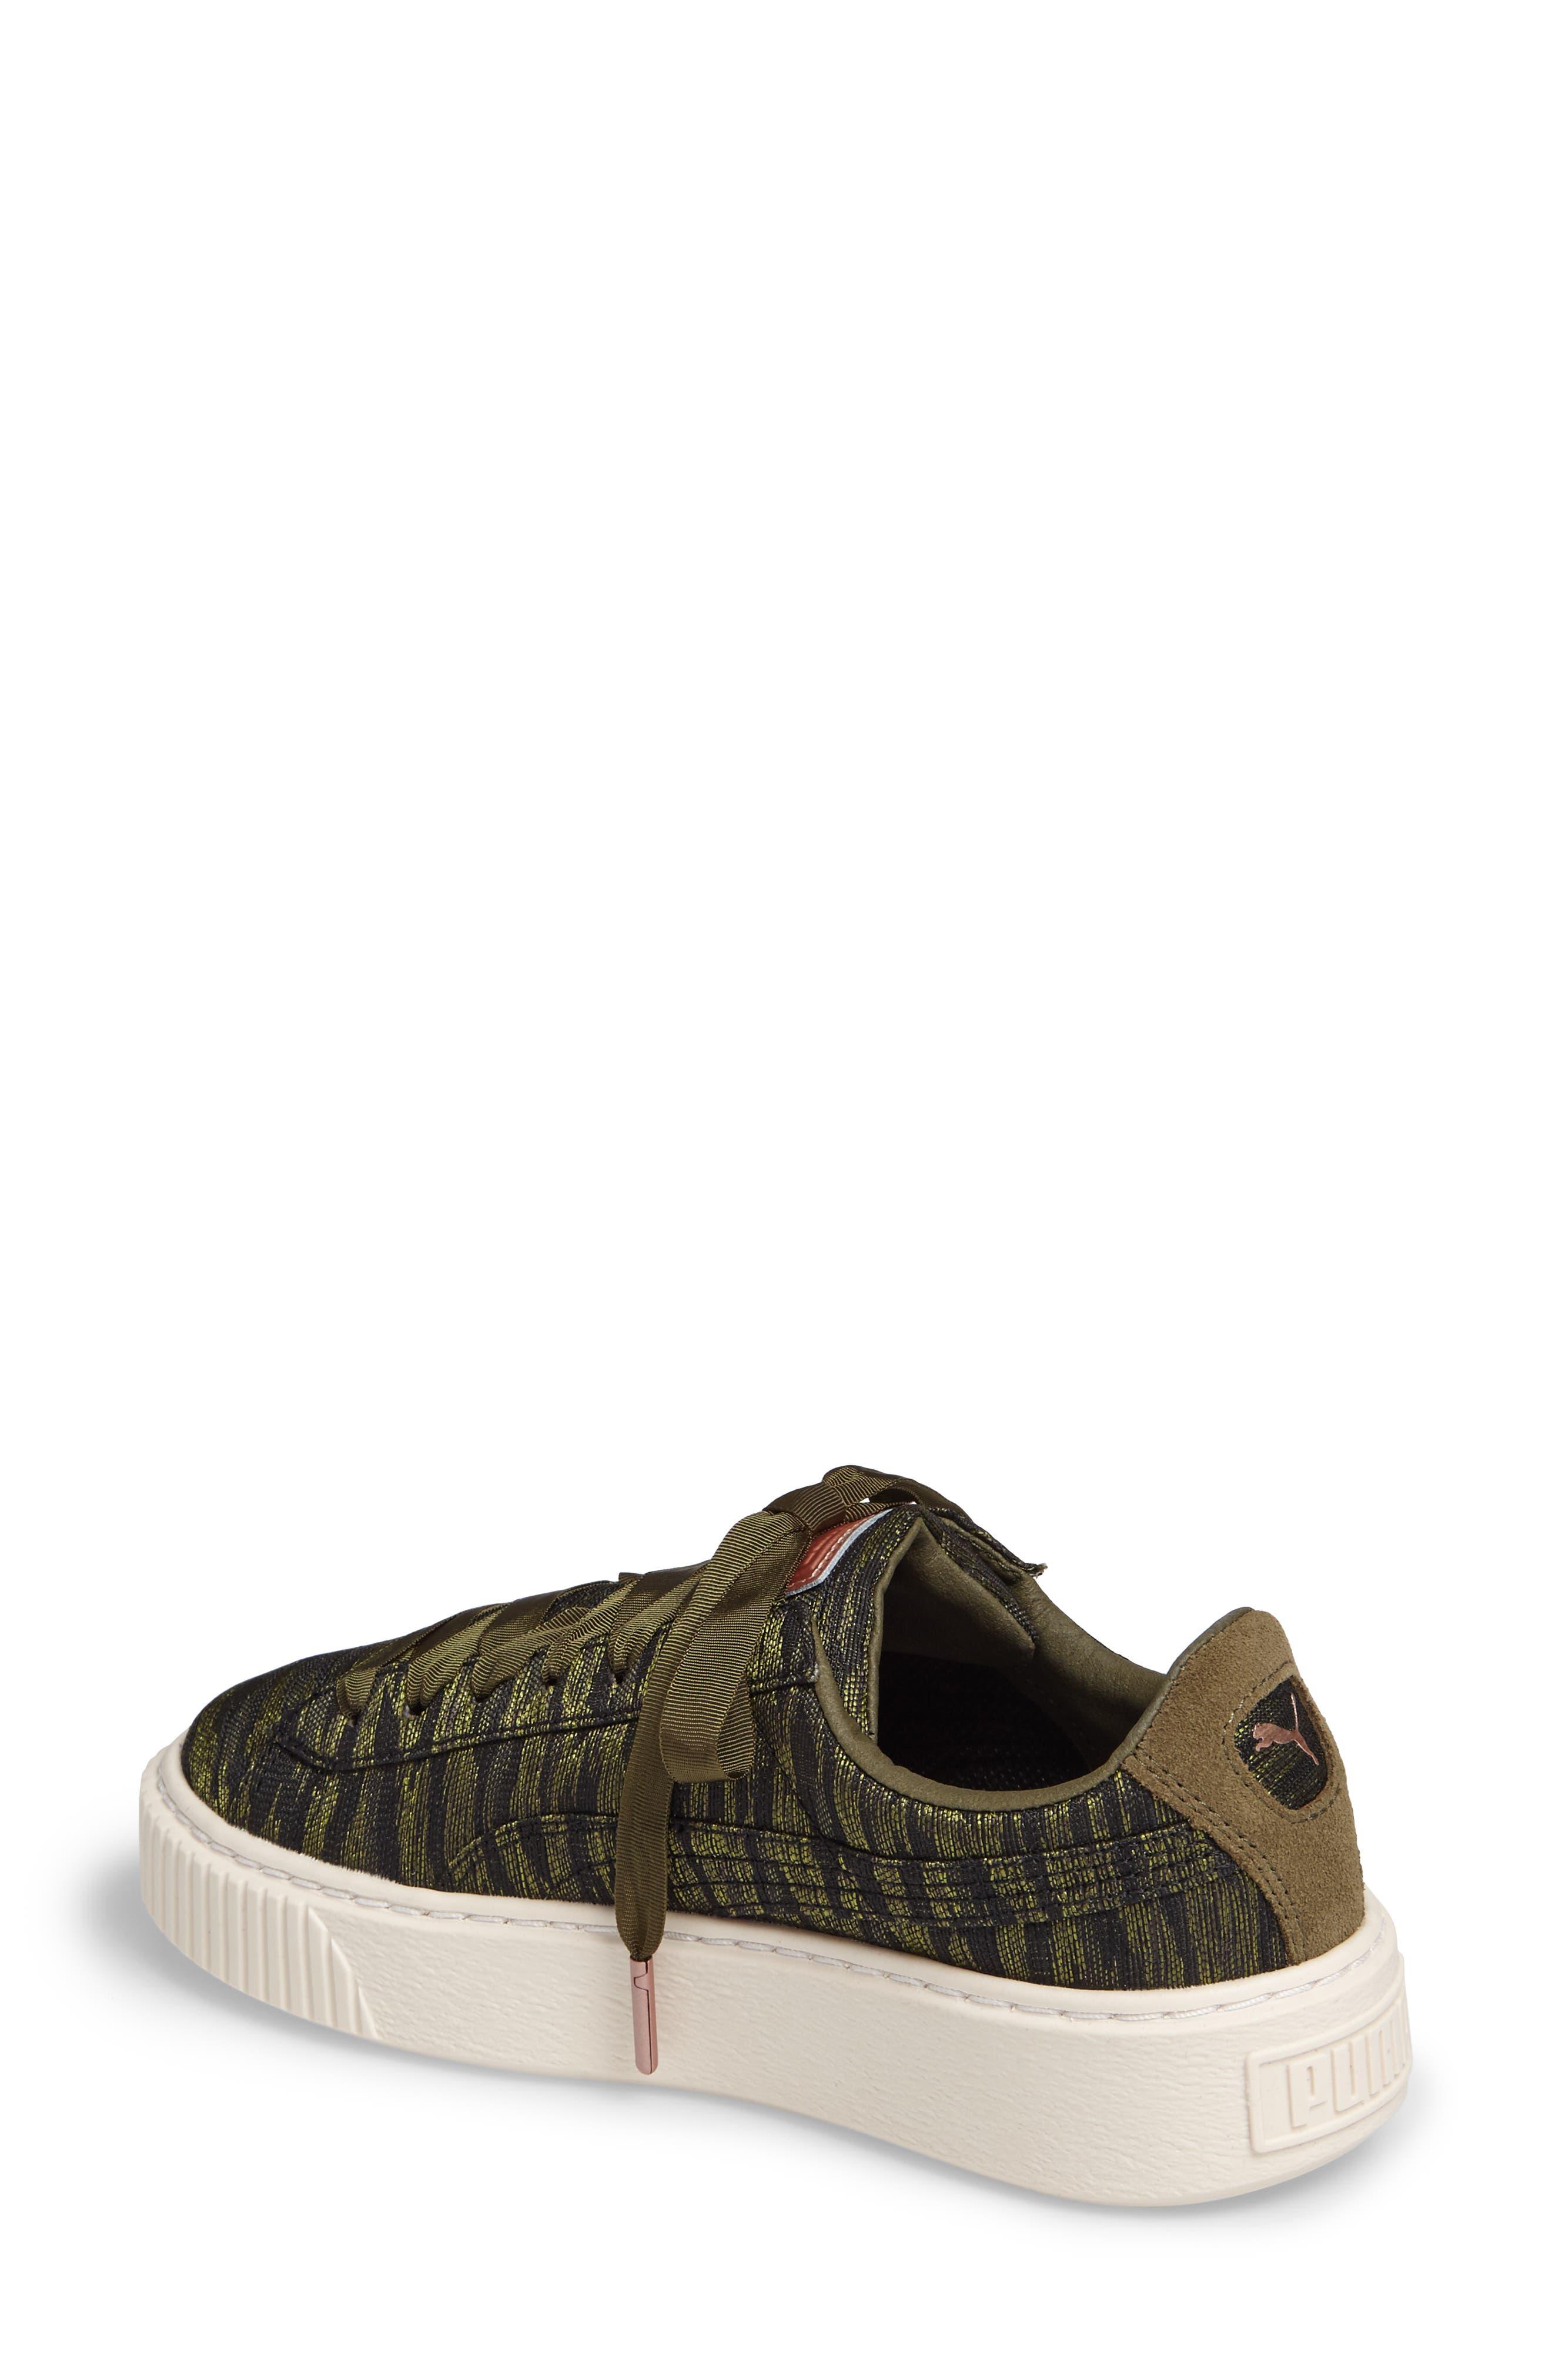 Alternate Image 2  - PUMA Basket Platform Sneaker (Women)